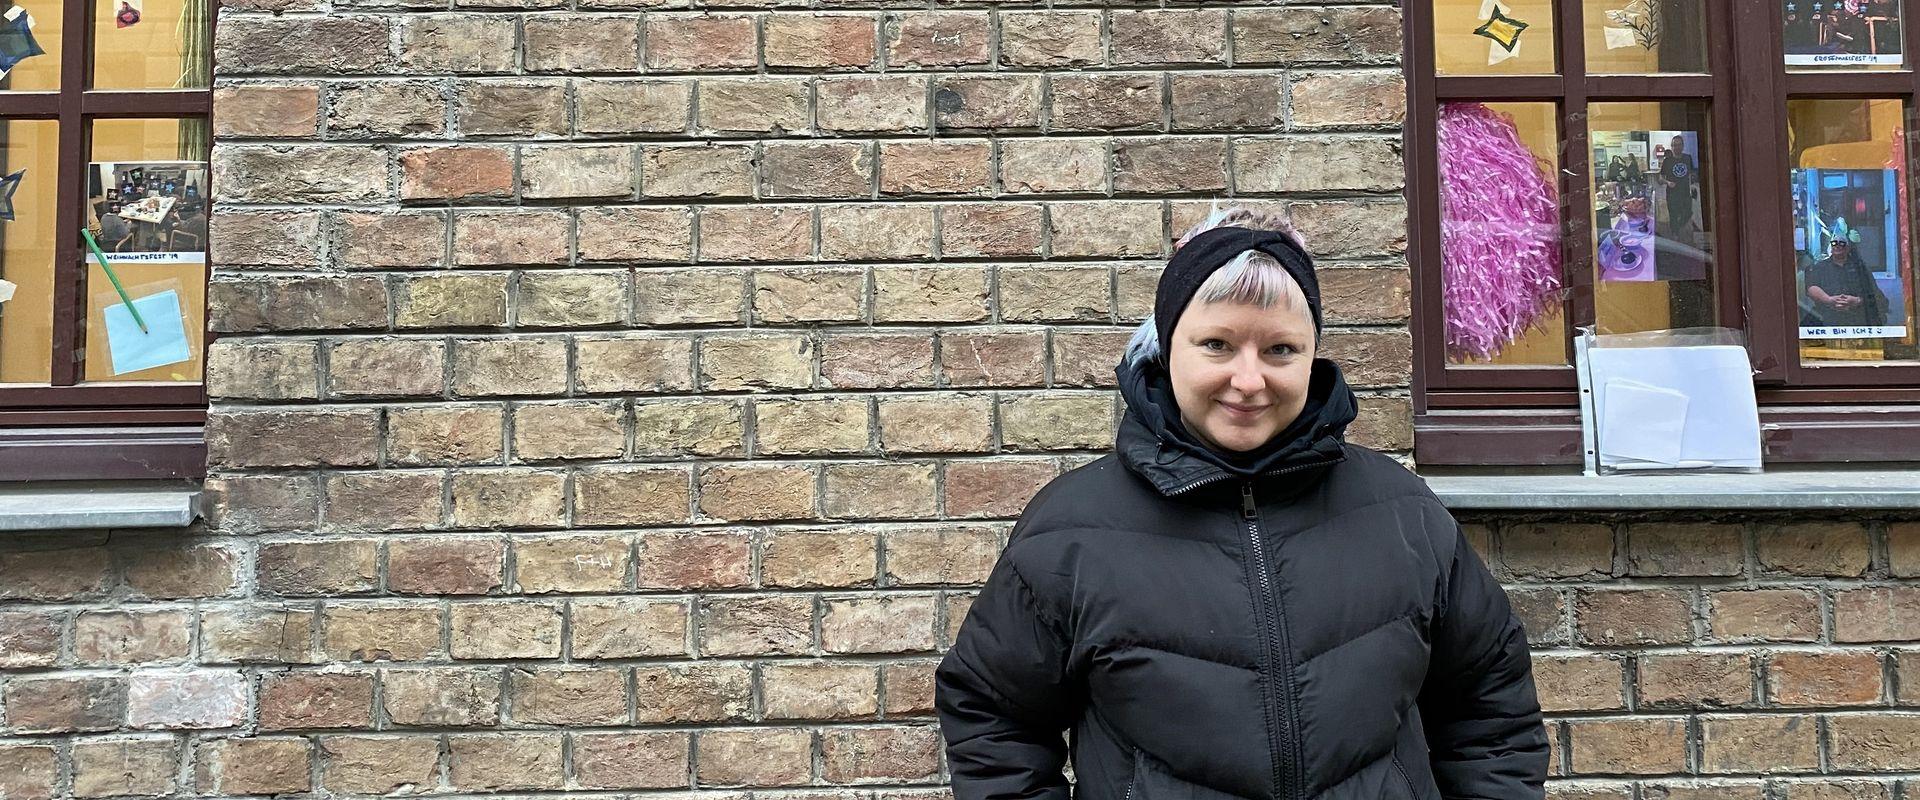 Sozialarbeiterin Julia Gleu vor den bebilderten Fenstern.